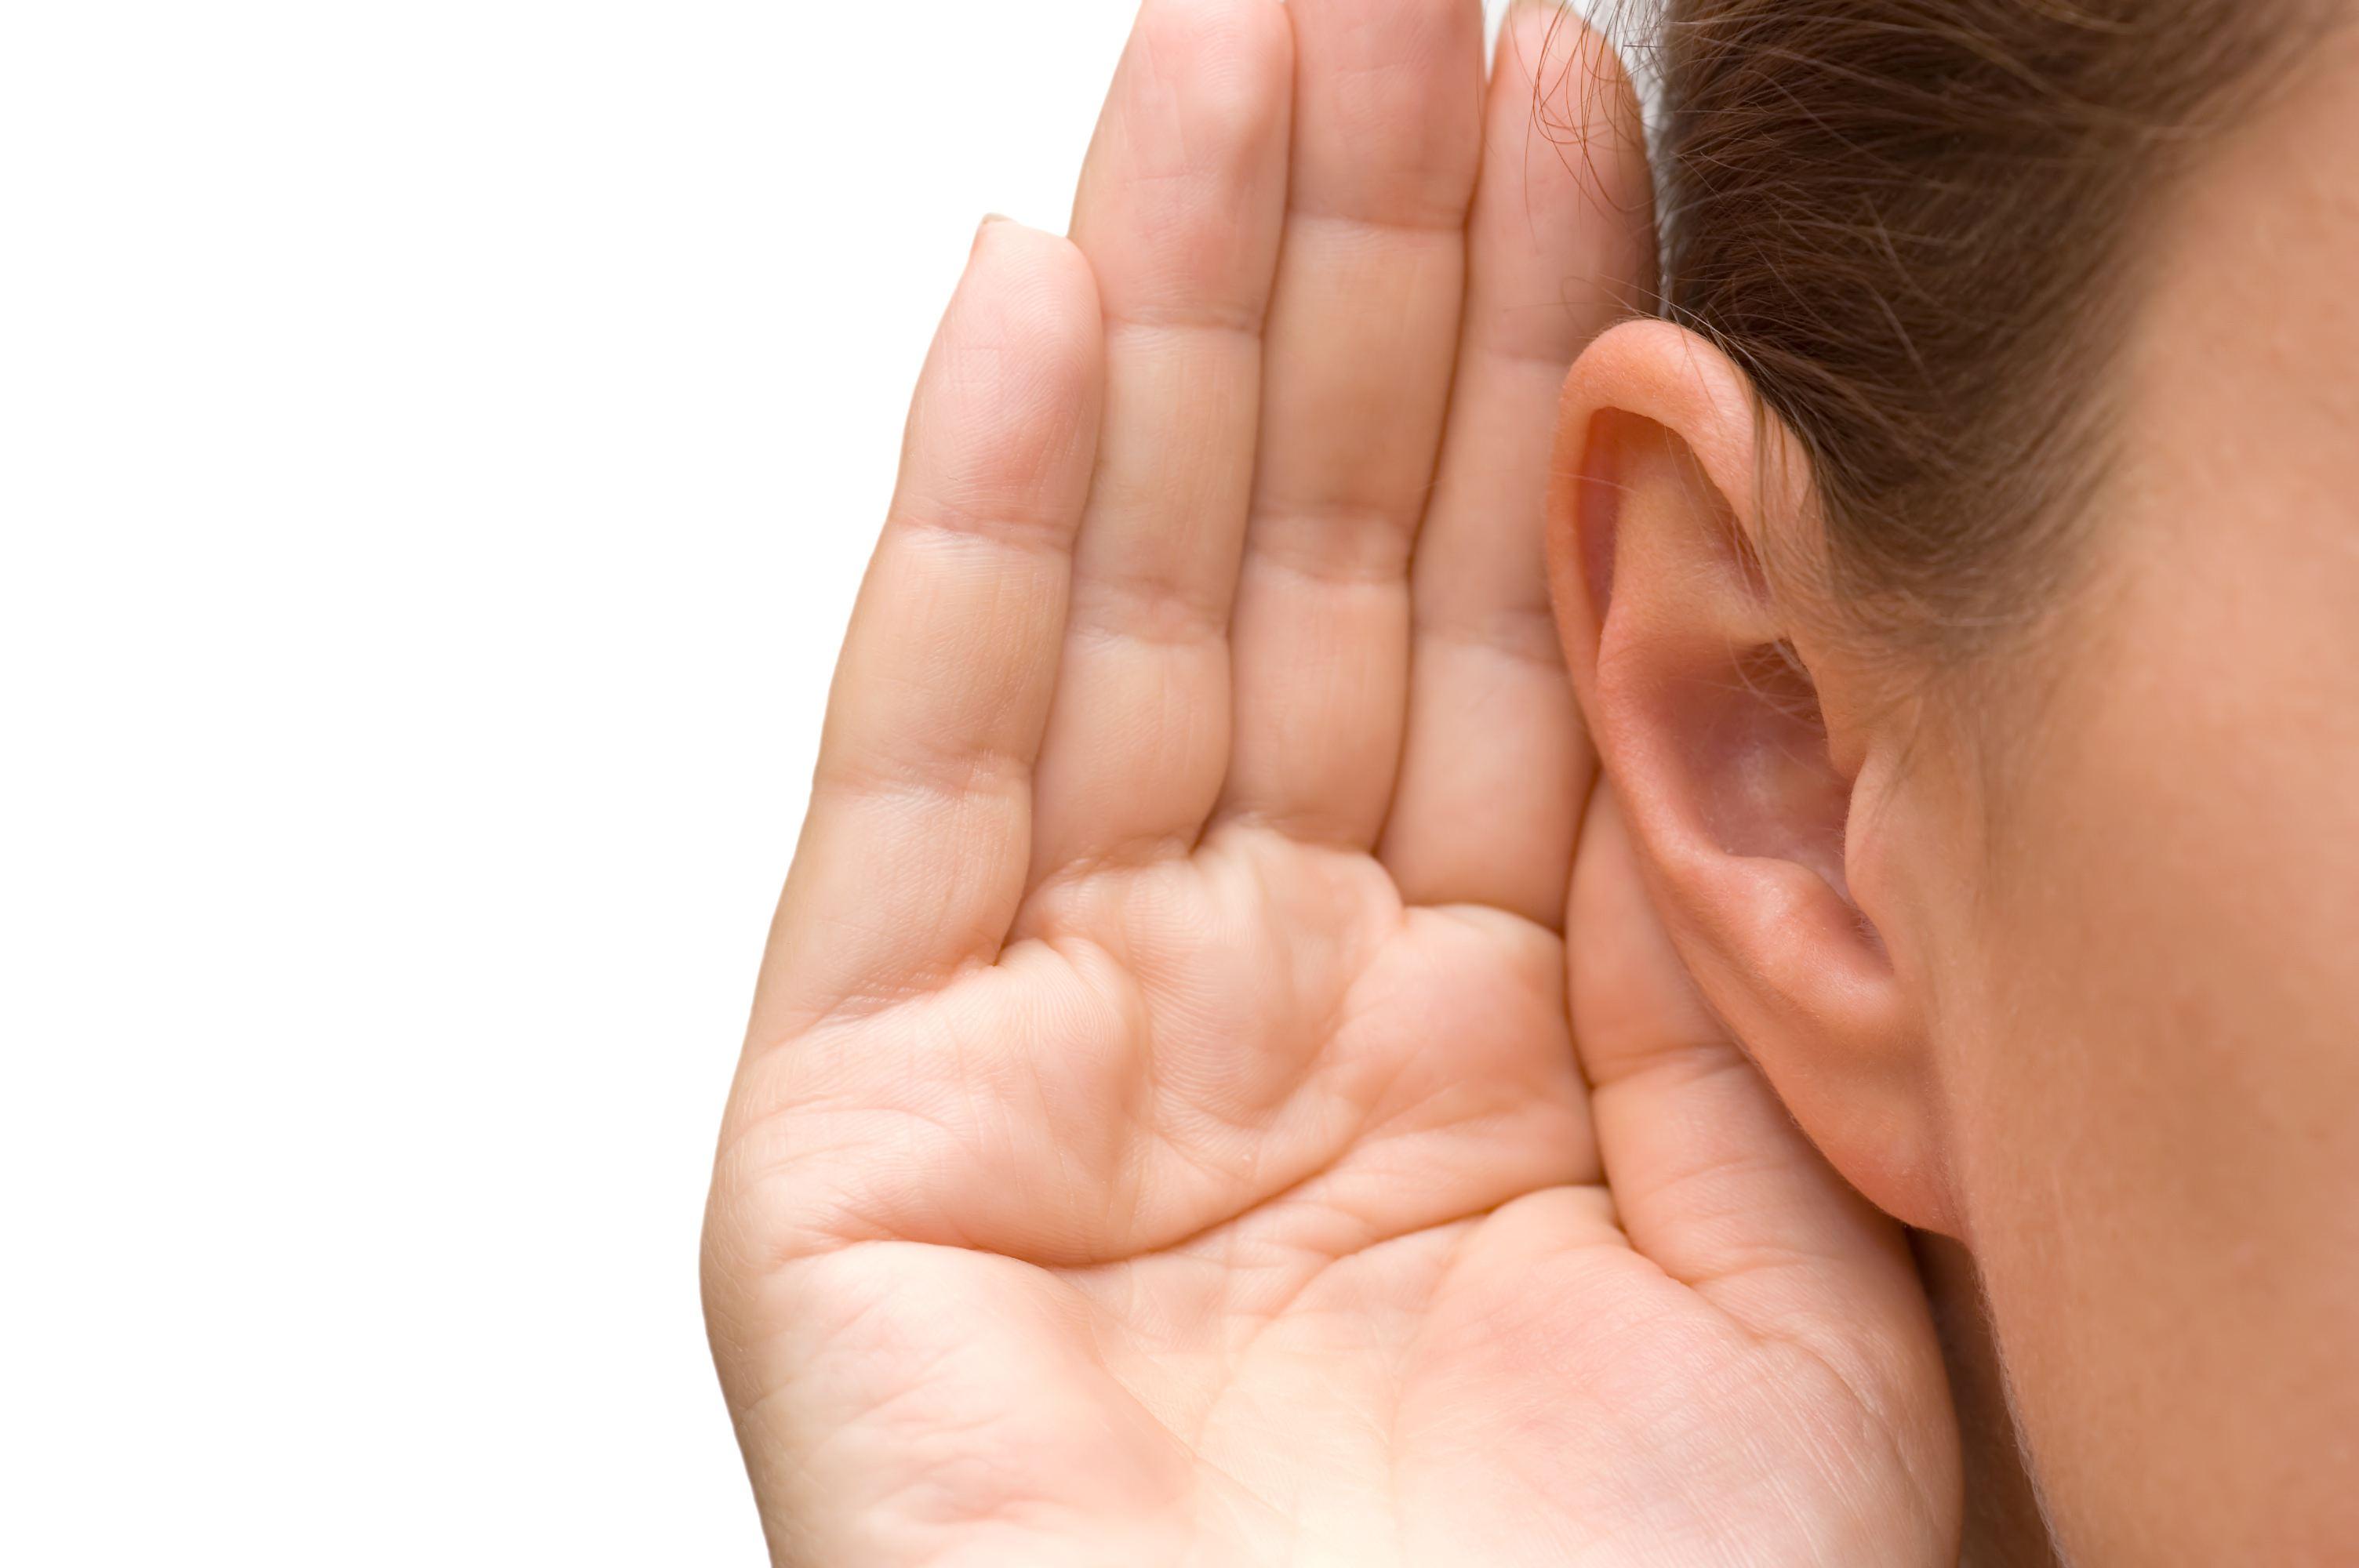 Whisper in ear clip art picture gallery